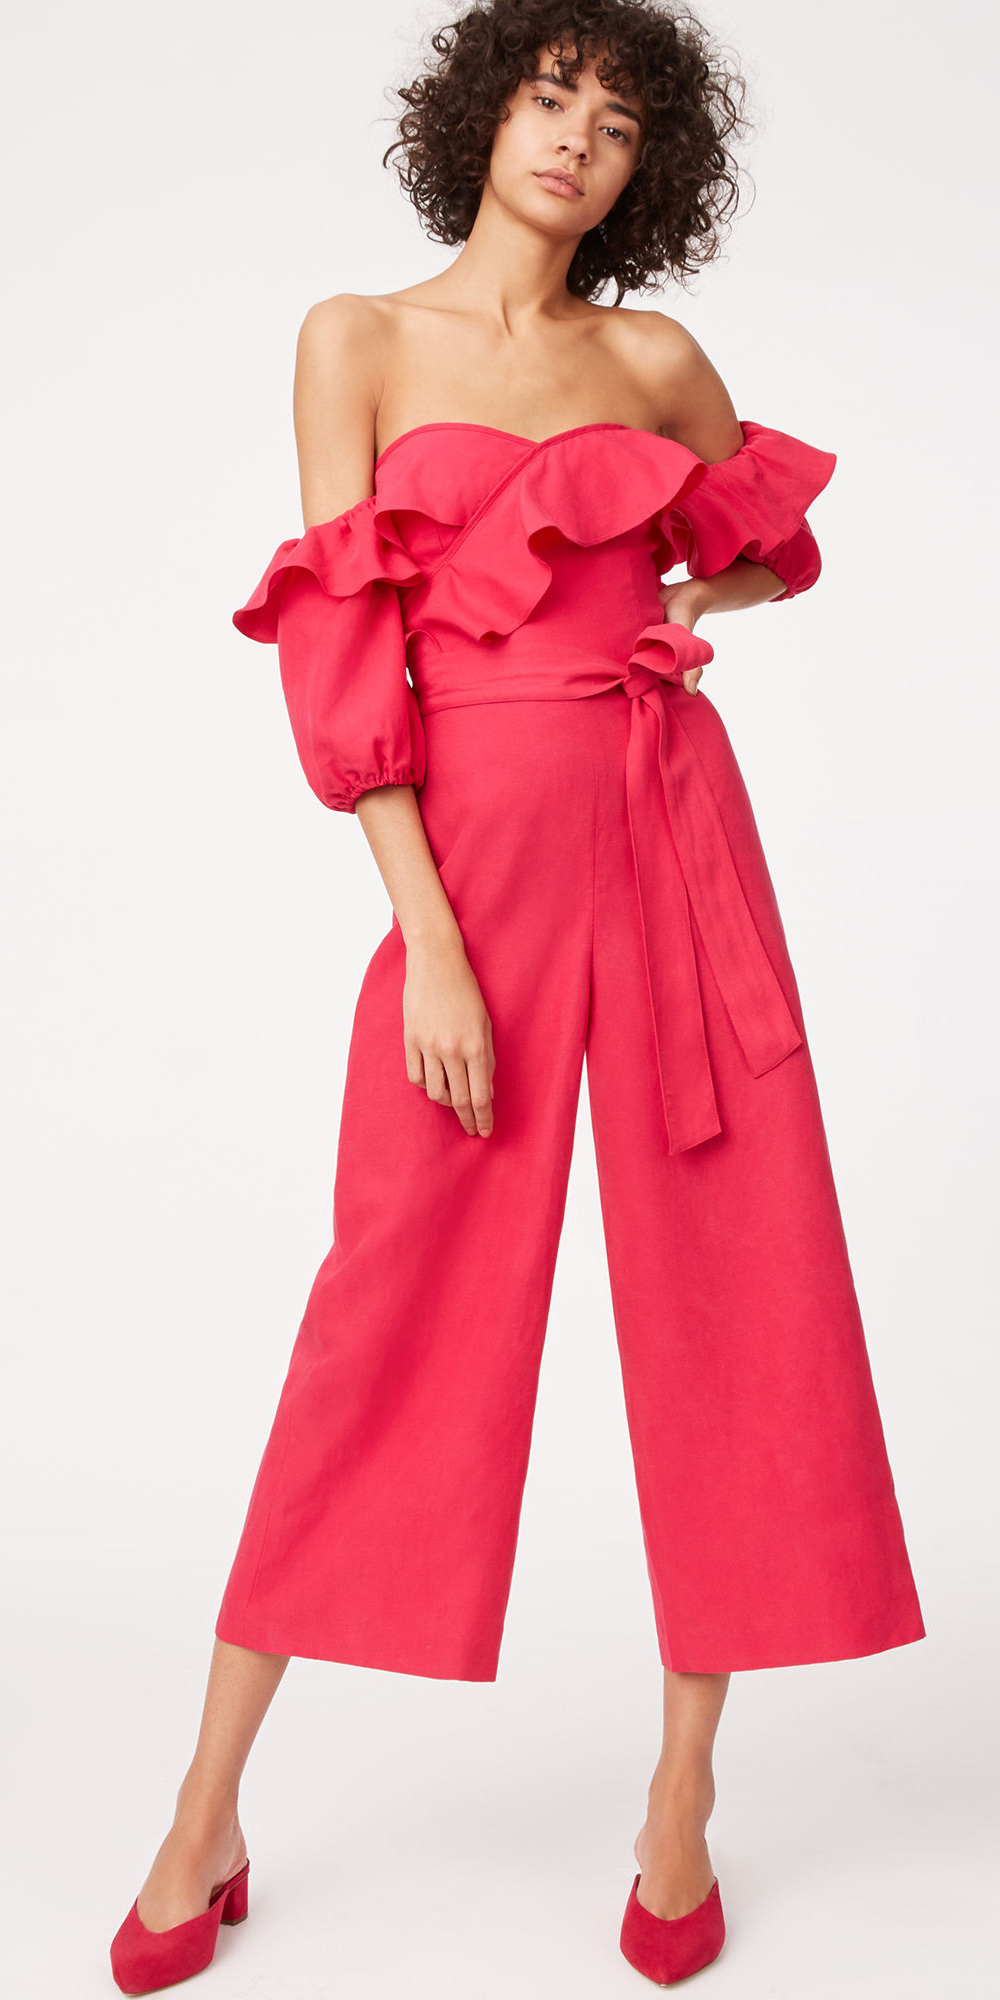 what-to-wear-for-a-spring-wedding-guest-outfit-pink-magenta-jumpsuit-offshoulder-magenta-shoe-pumps-dinner.jpg